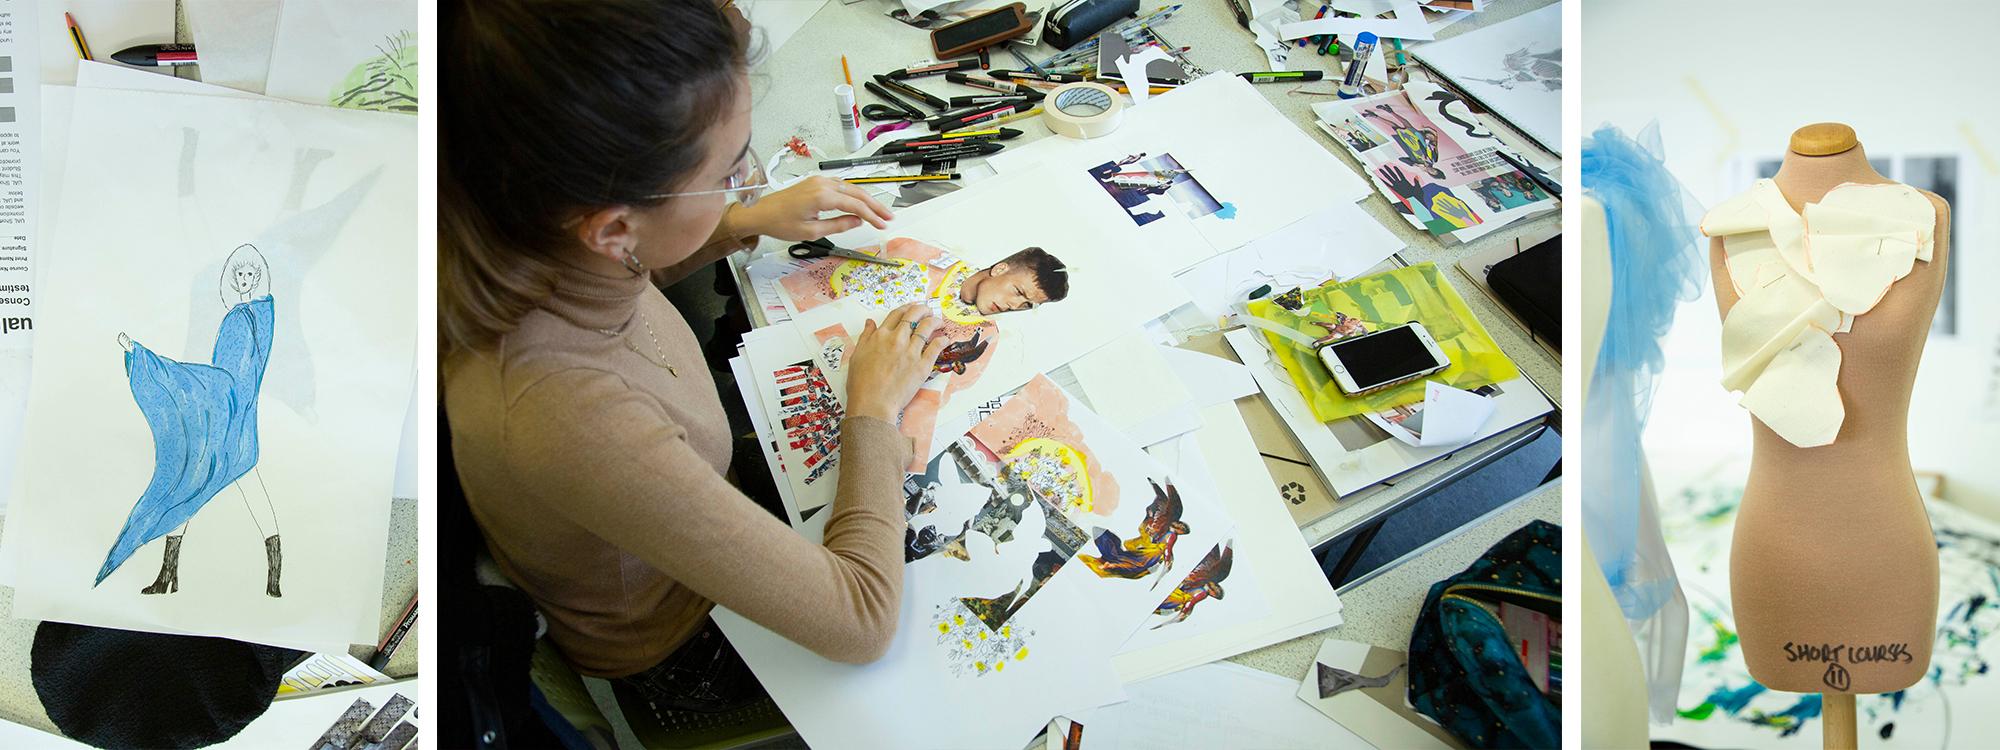 Fashion Design Intensive Online Short Course Ual